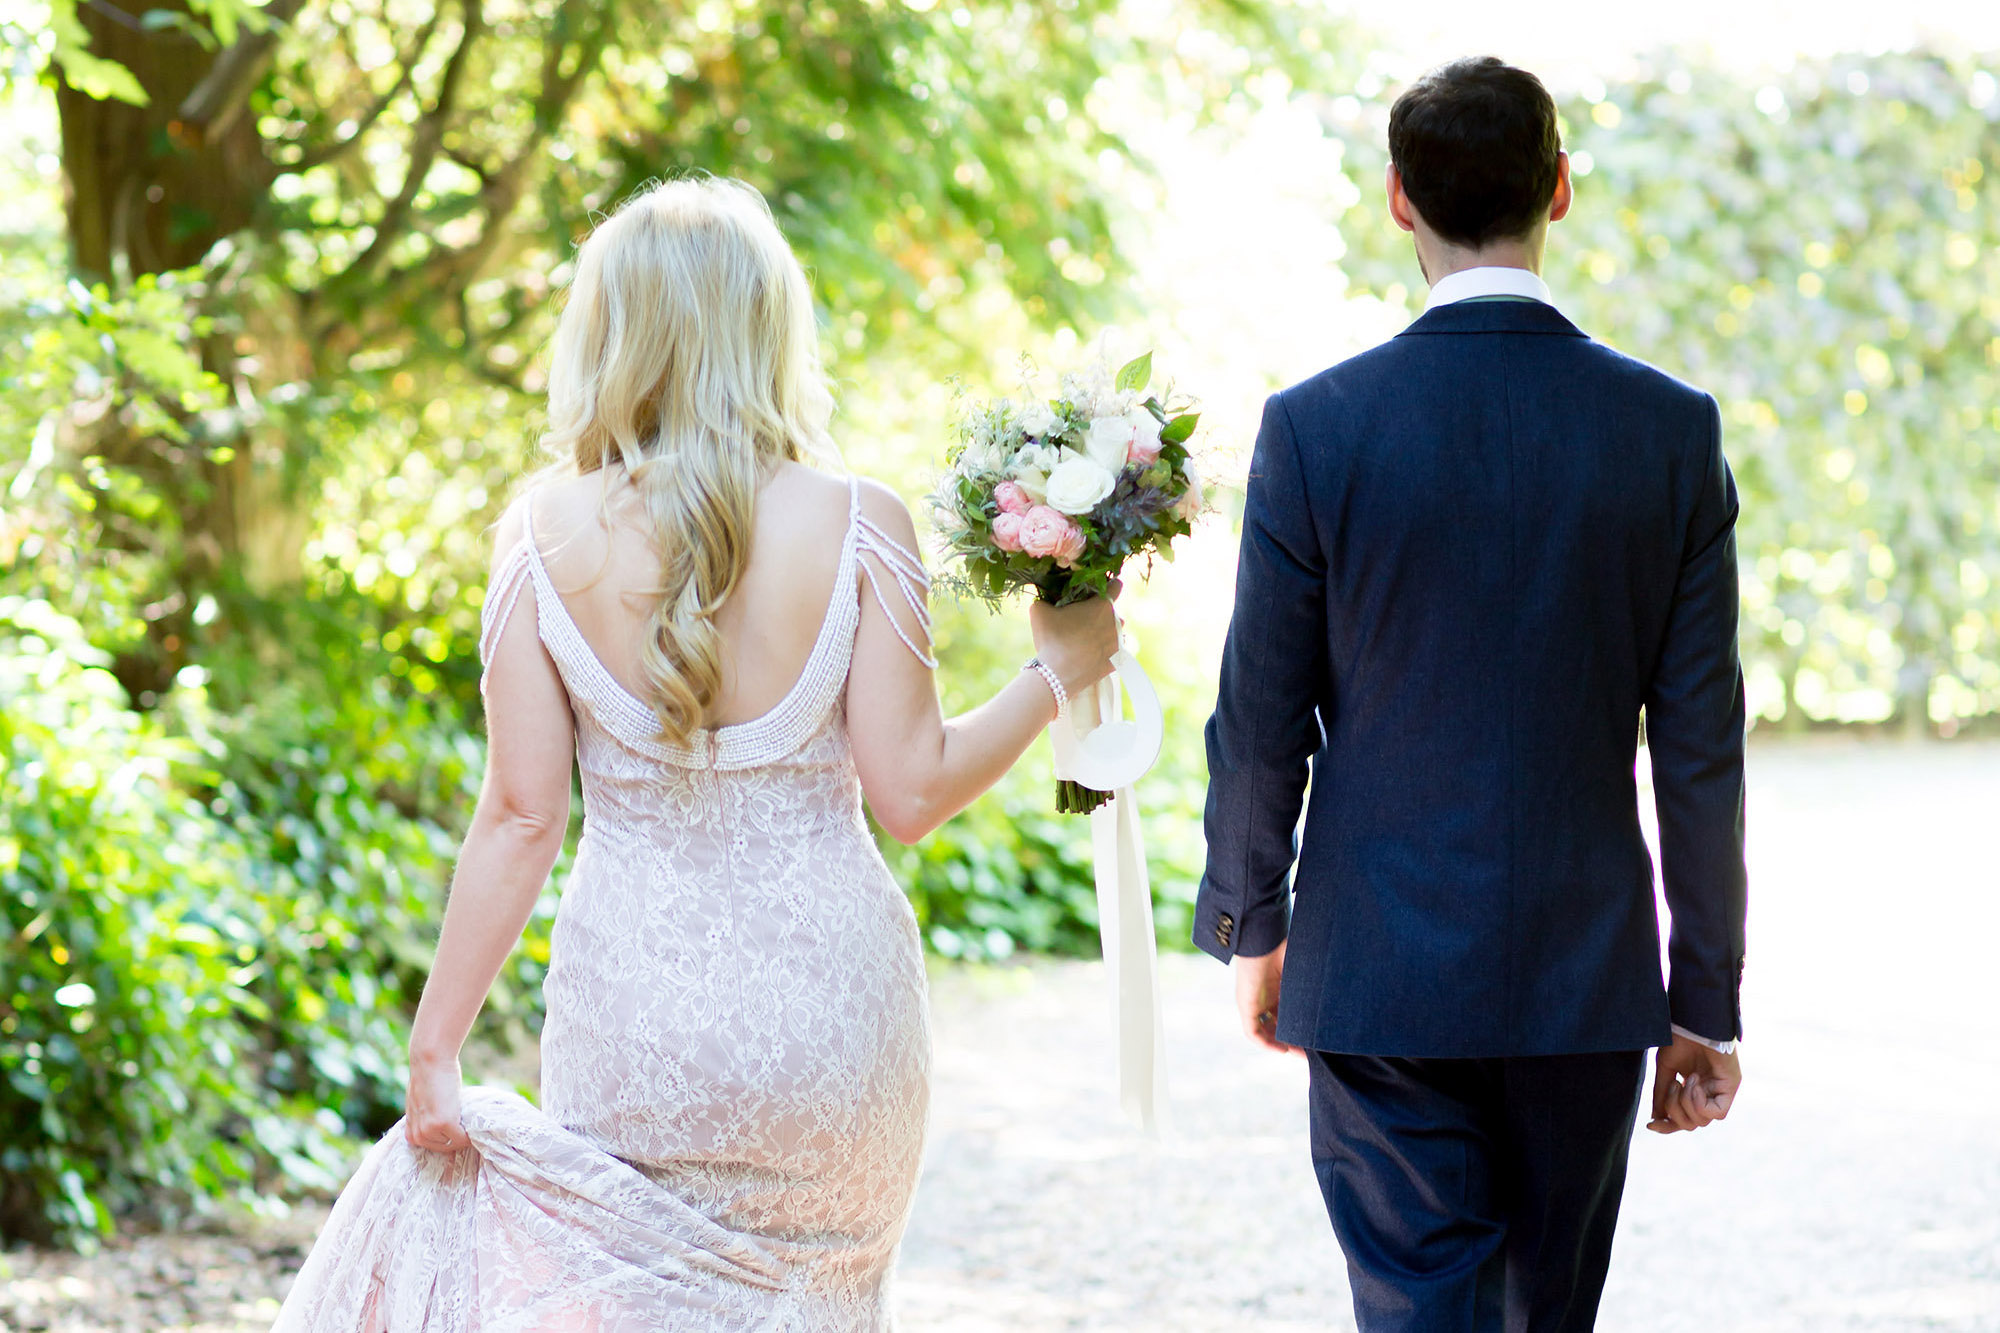 julia-toms-featured-weddings-west-sussex-005.jpg